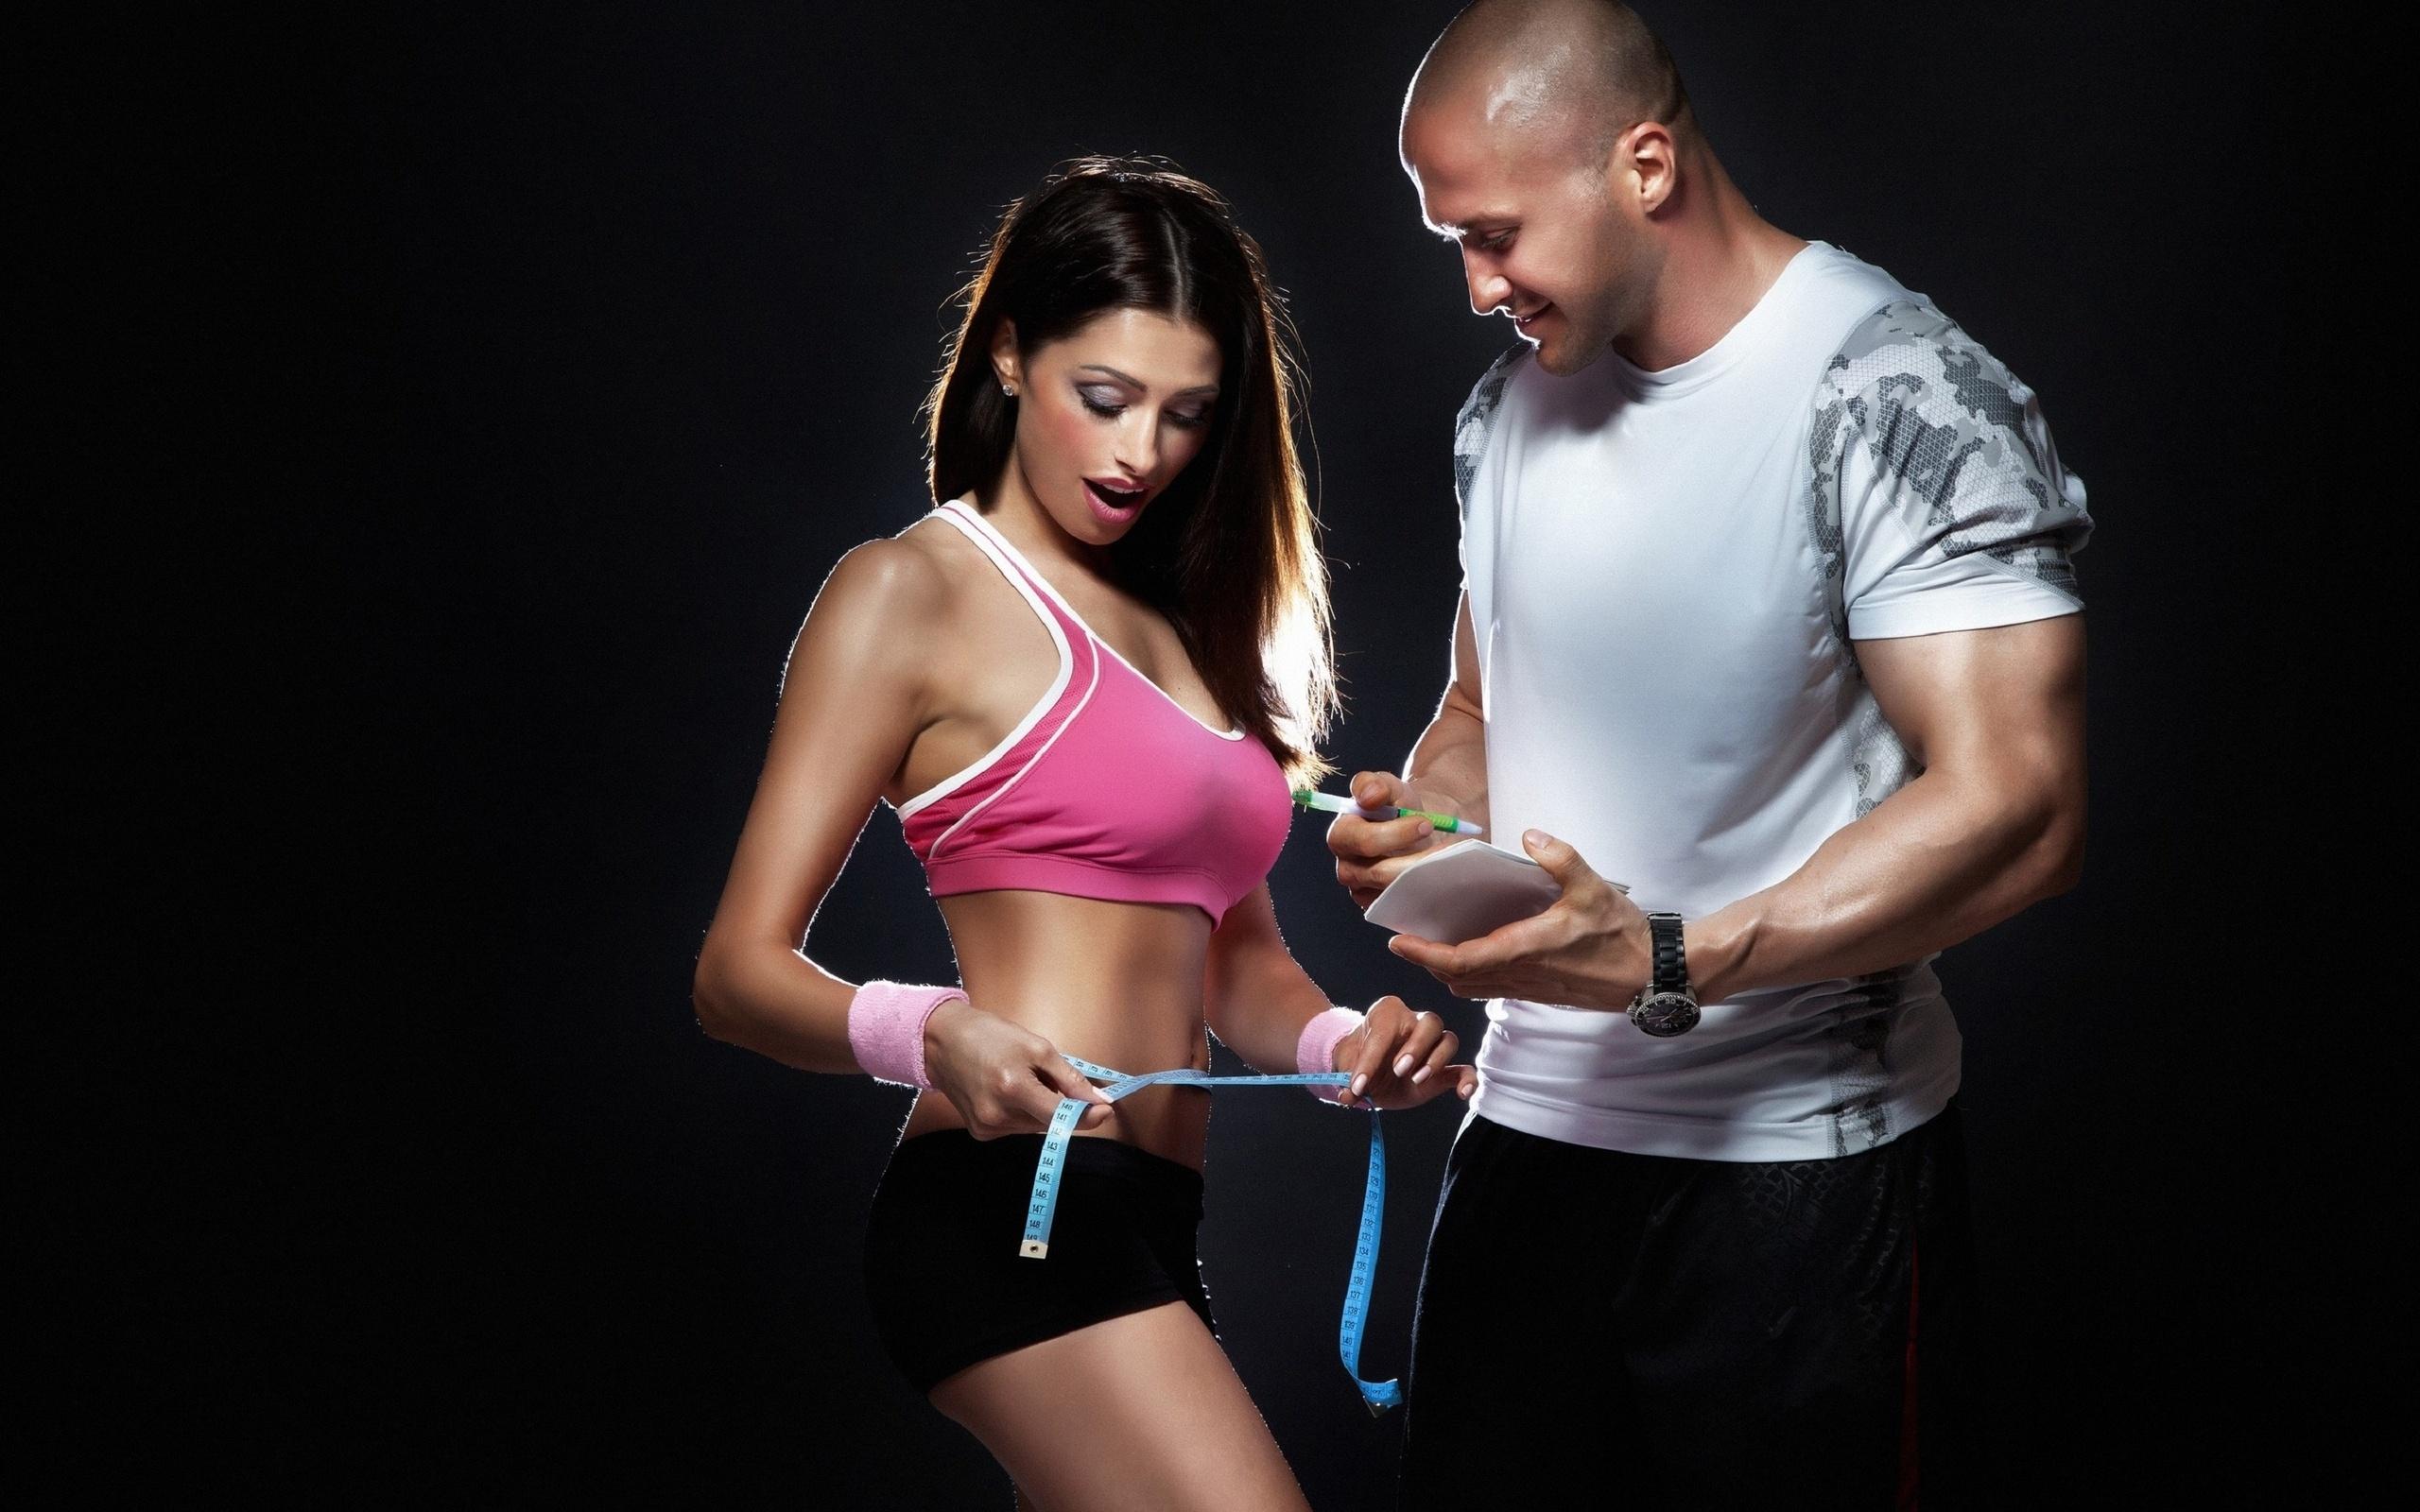 фитнес девушки борются с мужчинами шоу фото легко